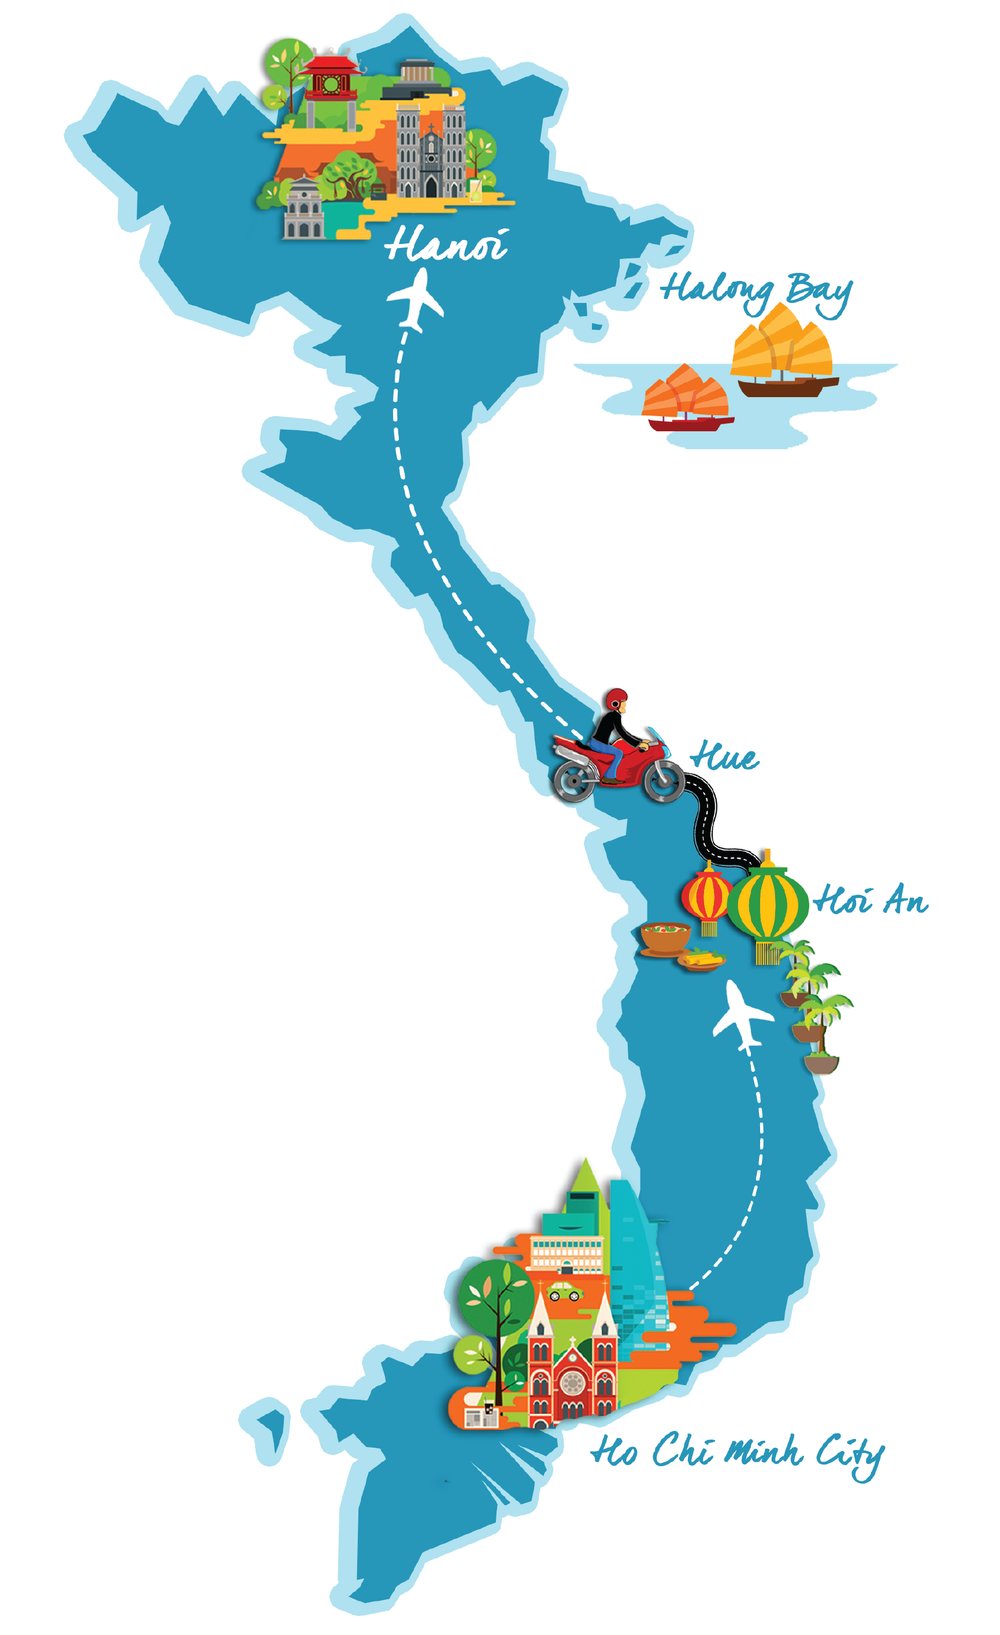 Vietnam Group Tour Map with Activities